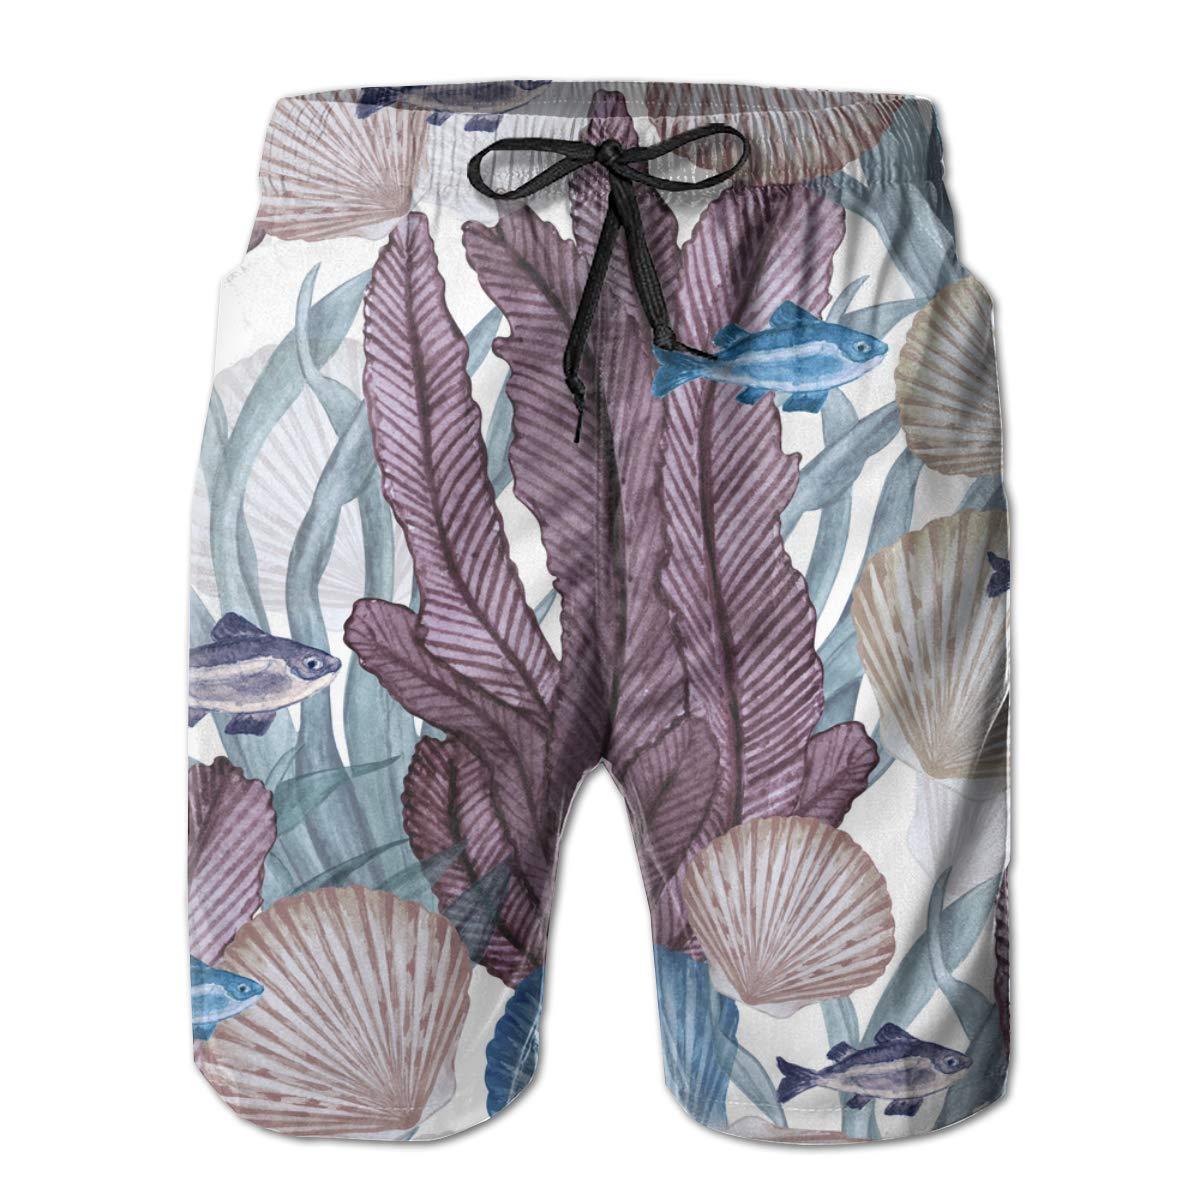 Summer Surfing Shorts Side Pocket Swim Trunks 3D Print Beach Board Shorts